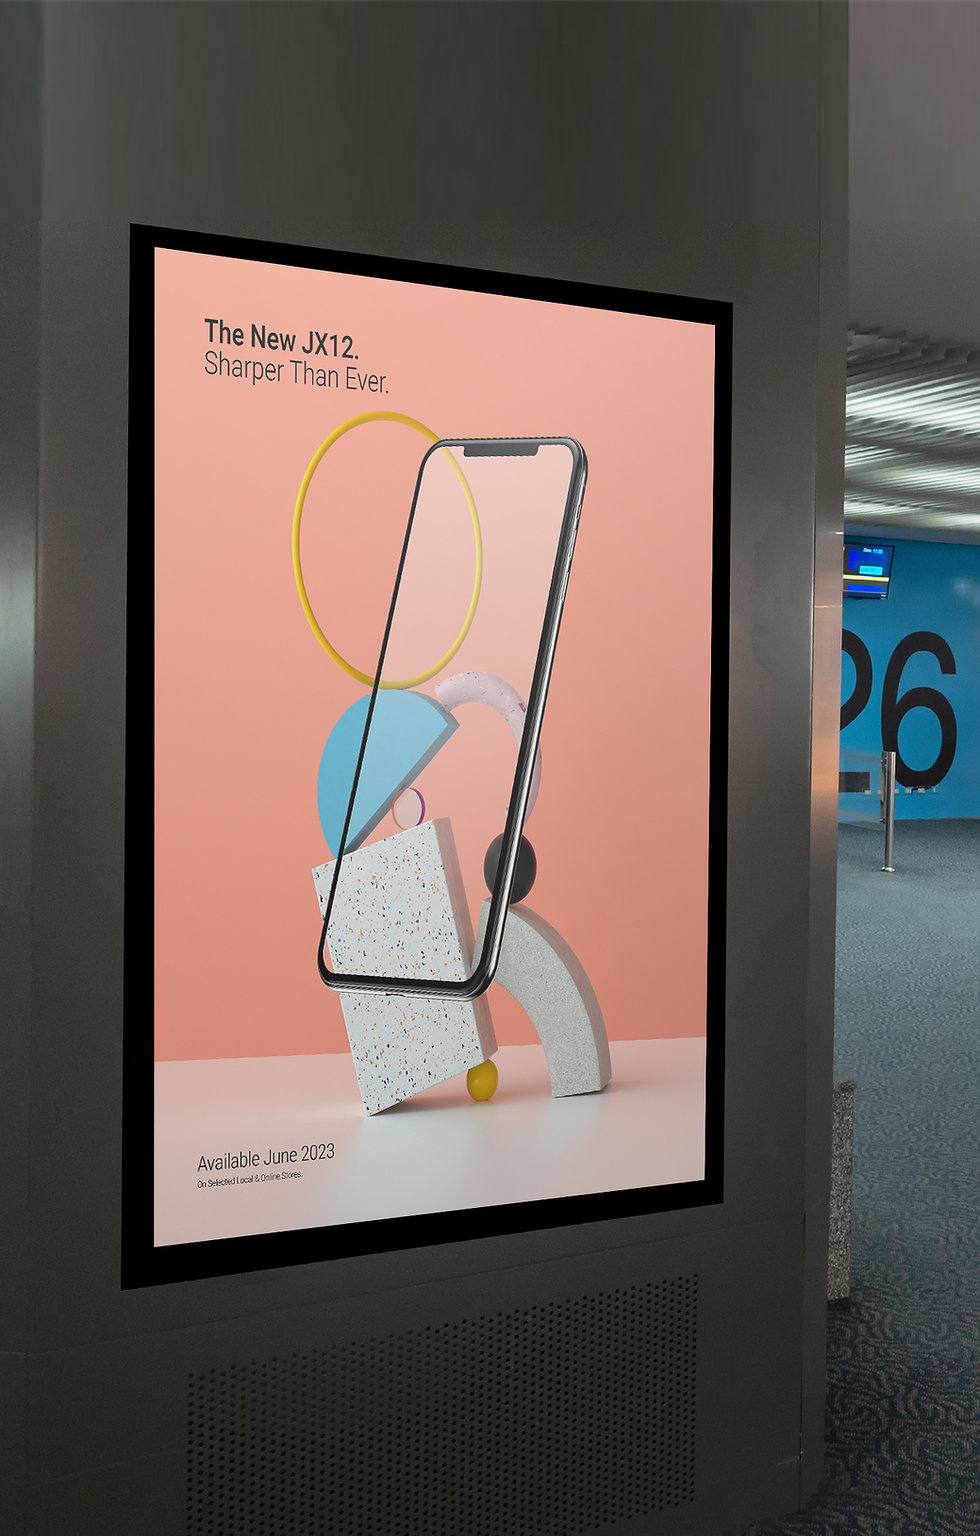 Mobile art ad